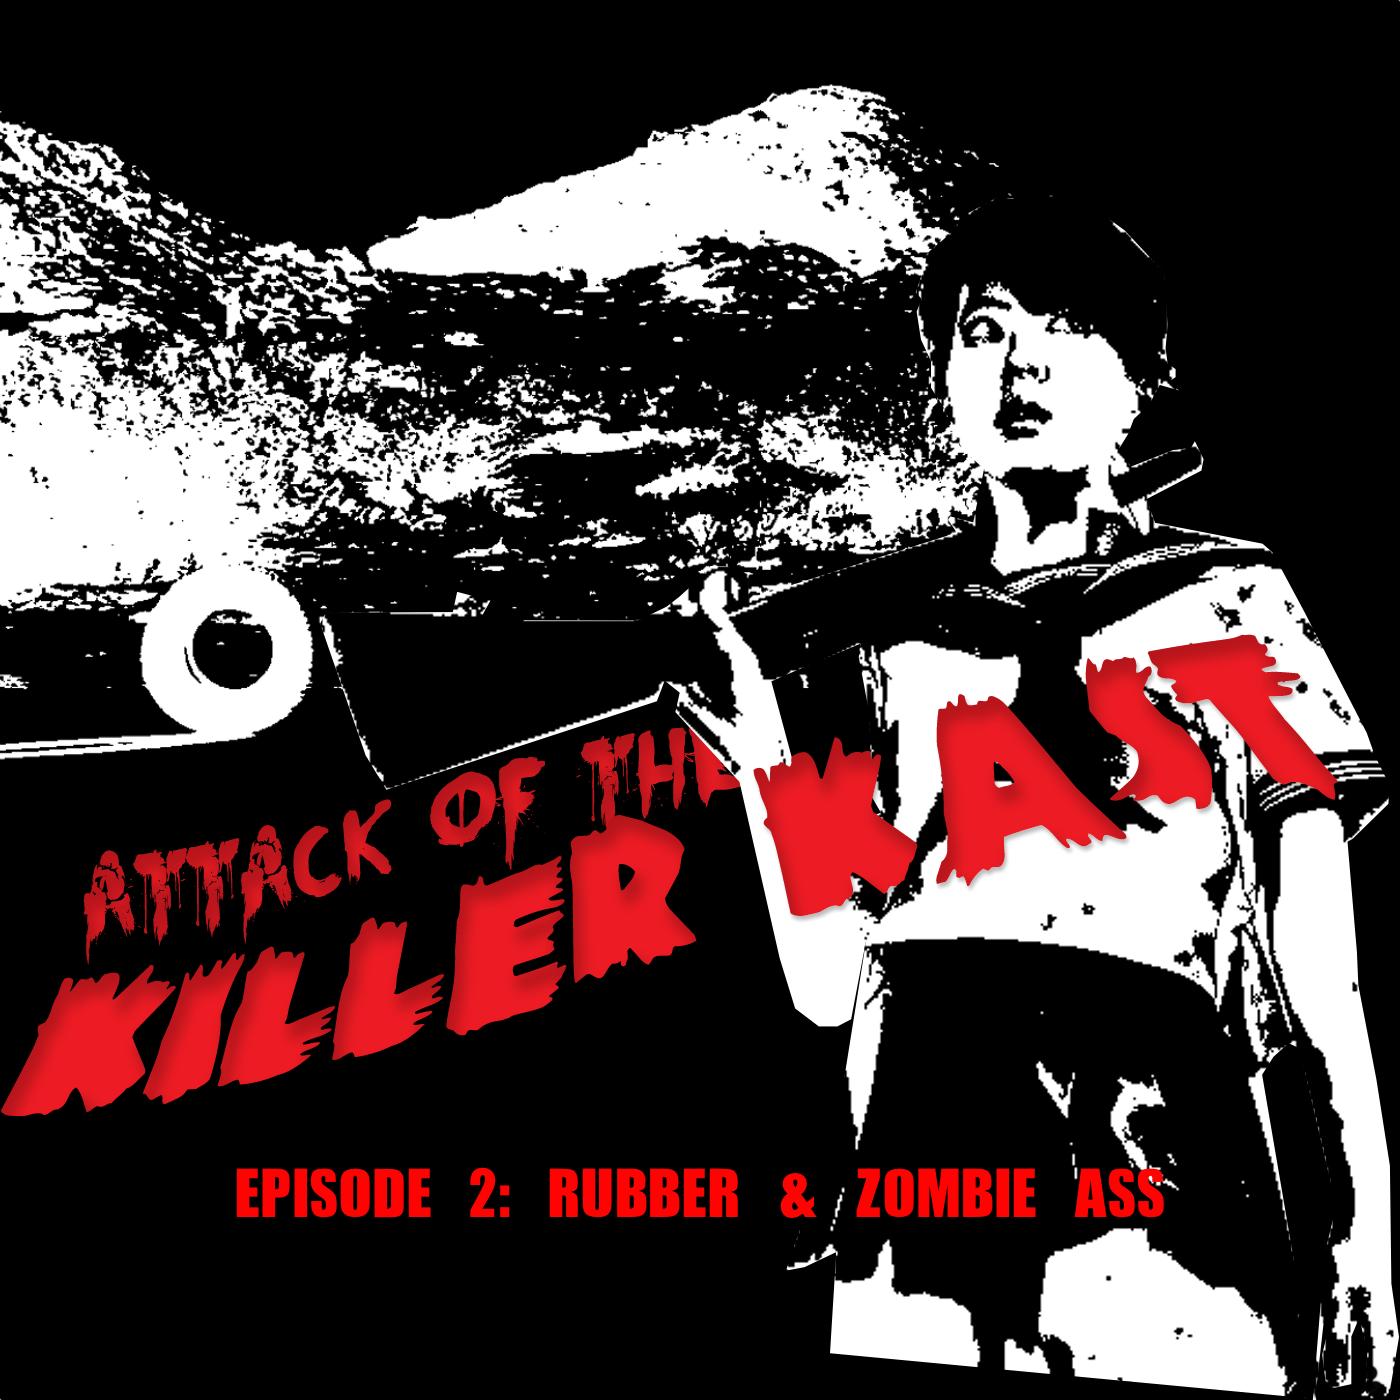 Episode 2: Rubber & Zombie Ass